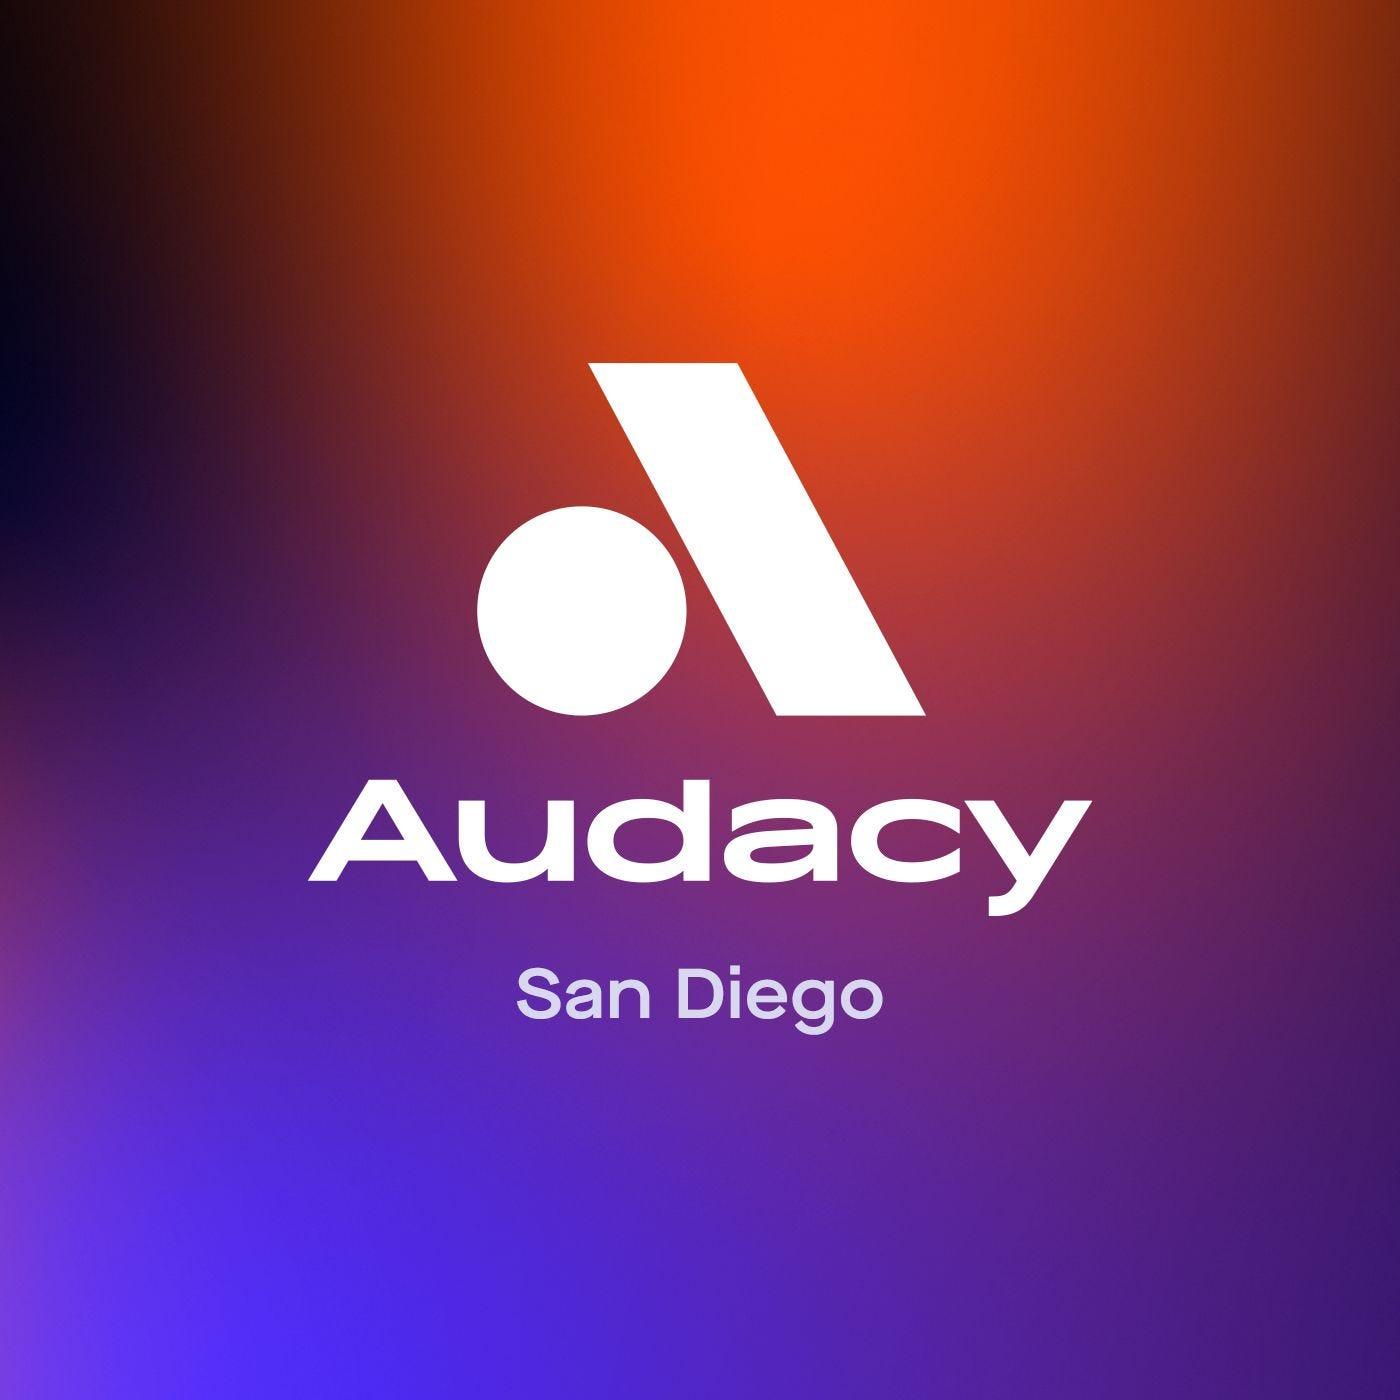 San Diego Syndicated